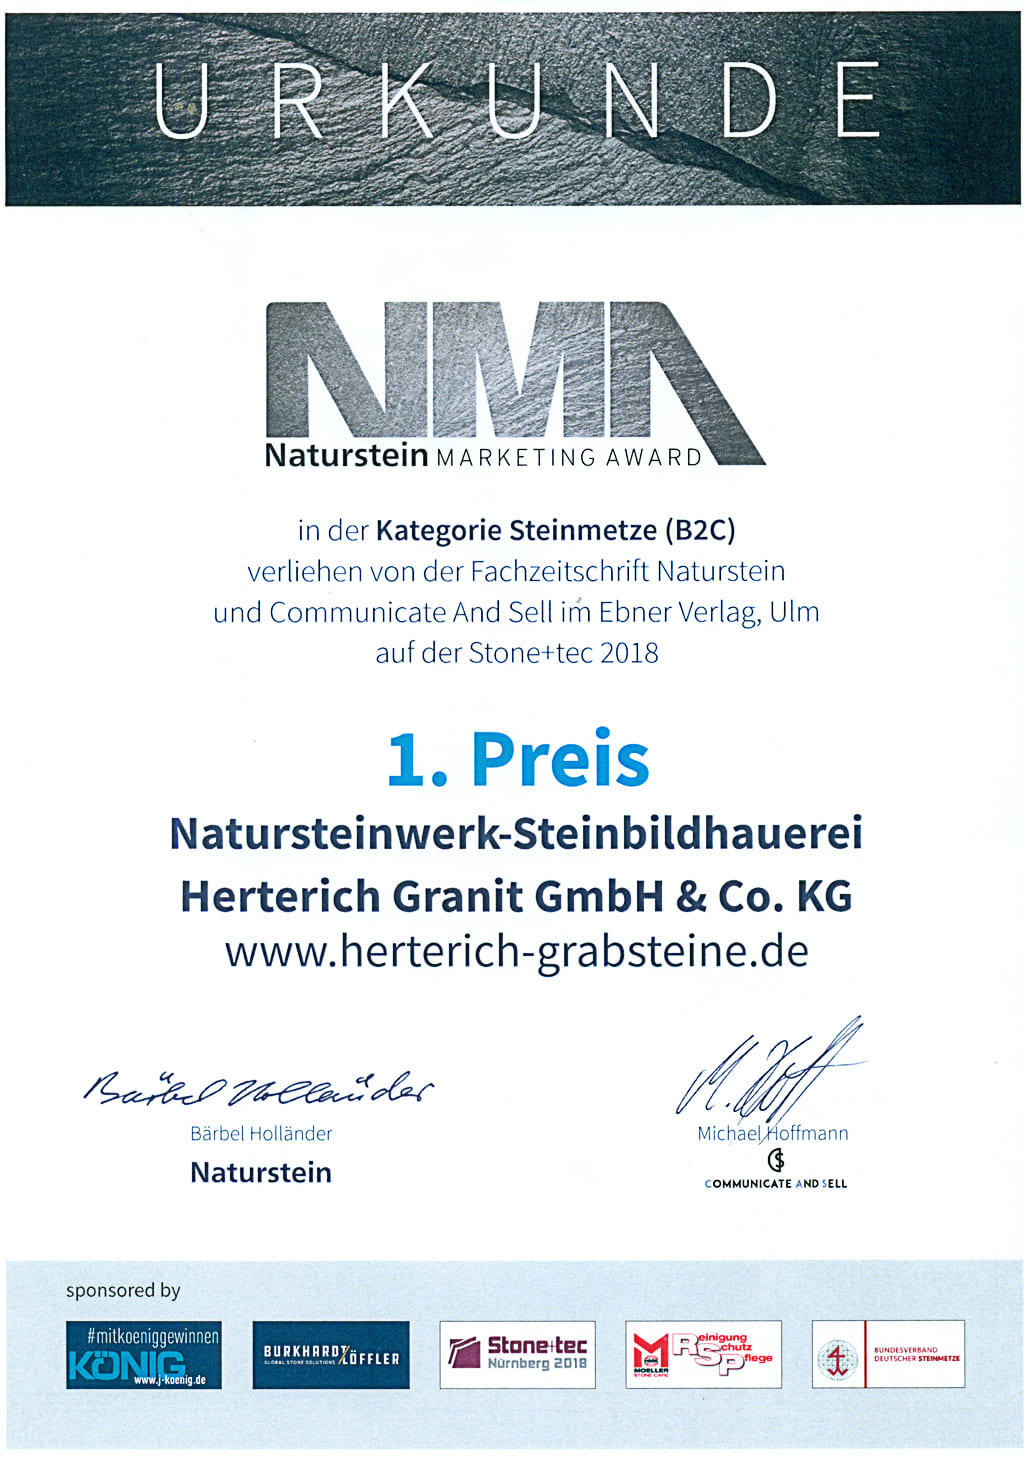 Naturstein-Marketing-Award-Urkunde